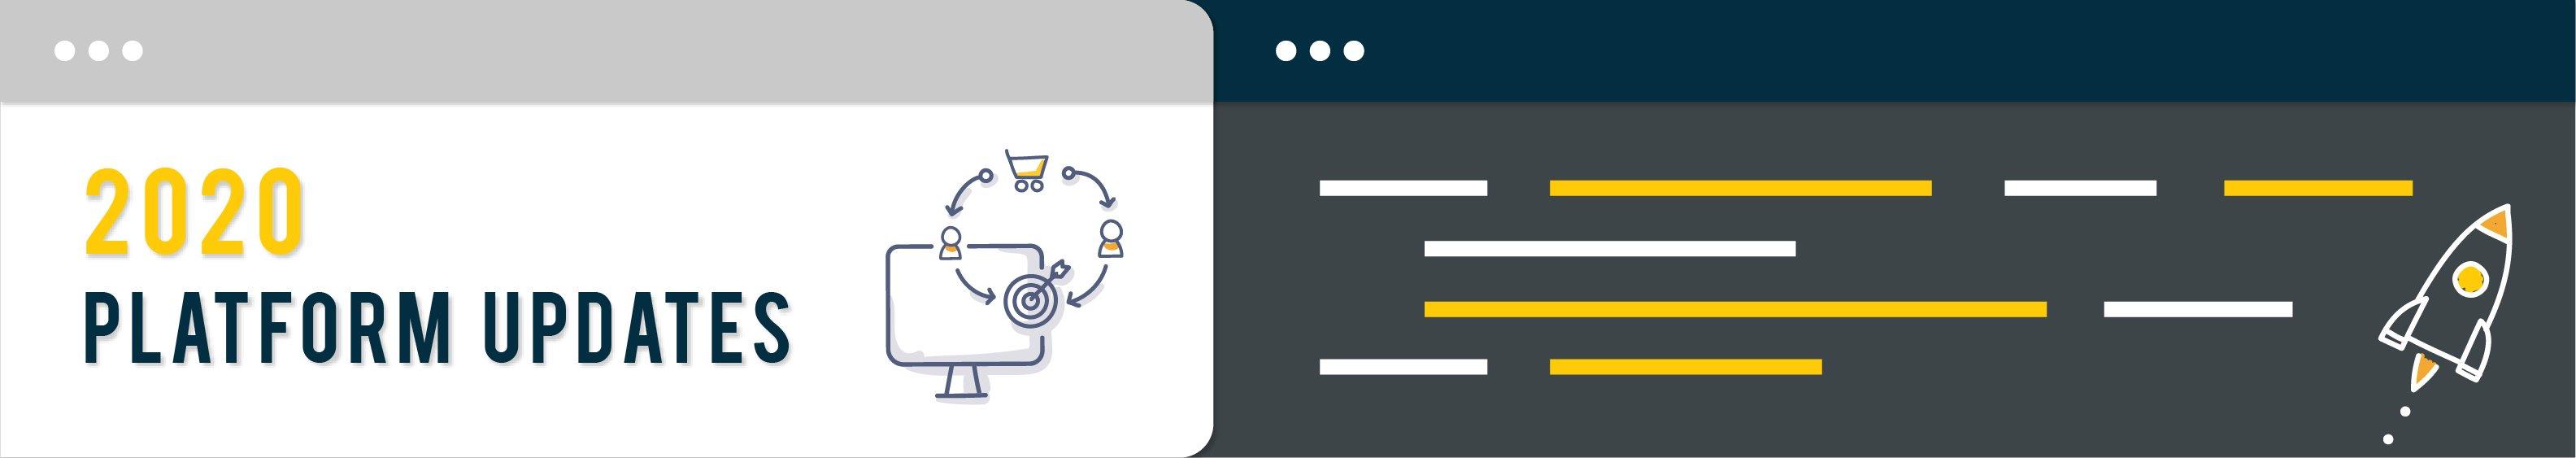 Innovations__2020 Platform Updates